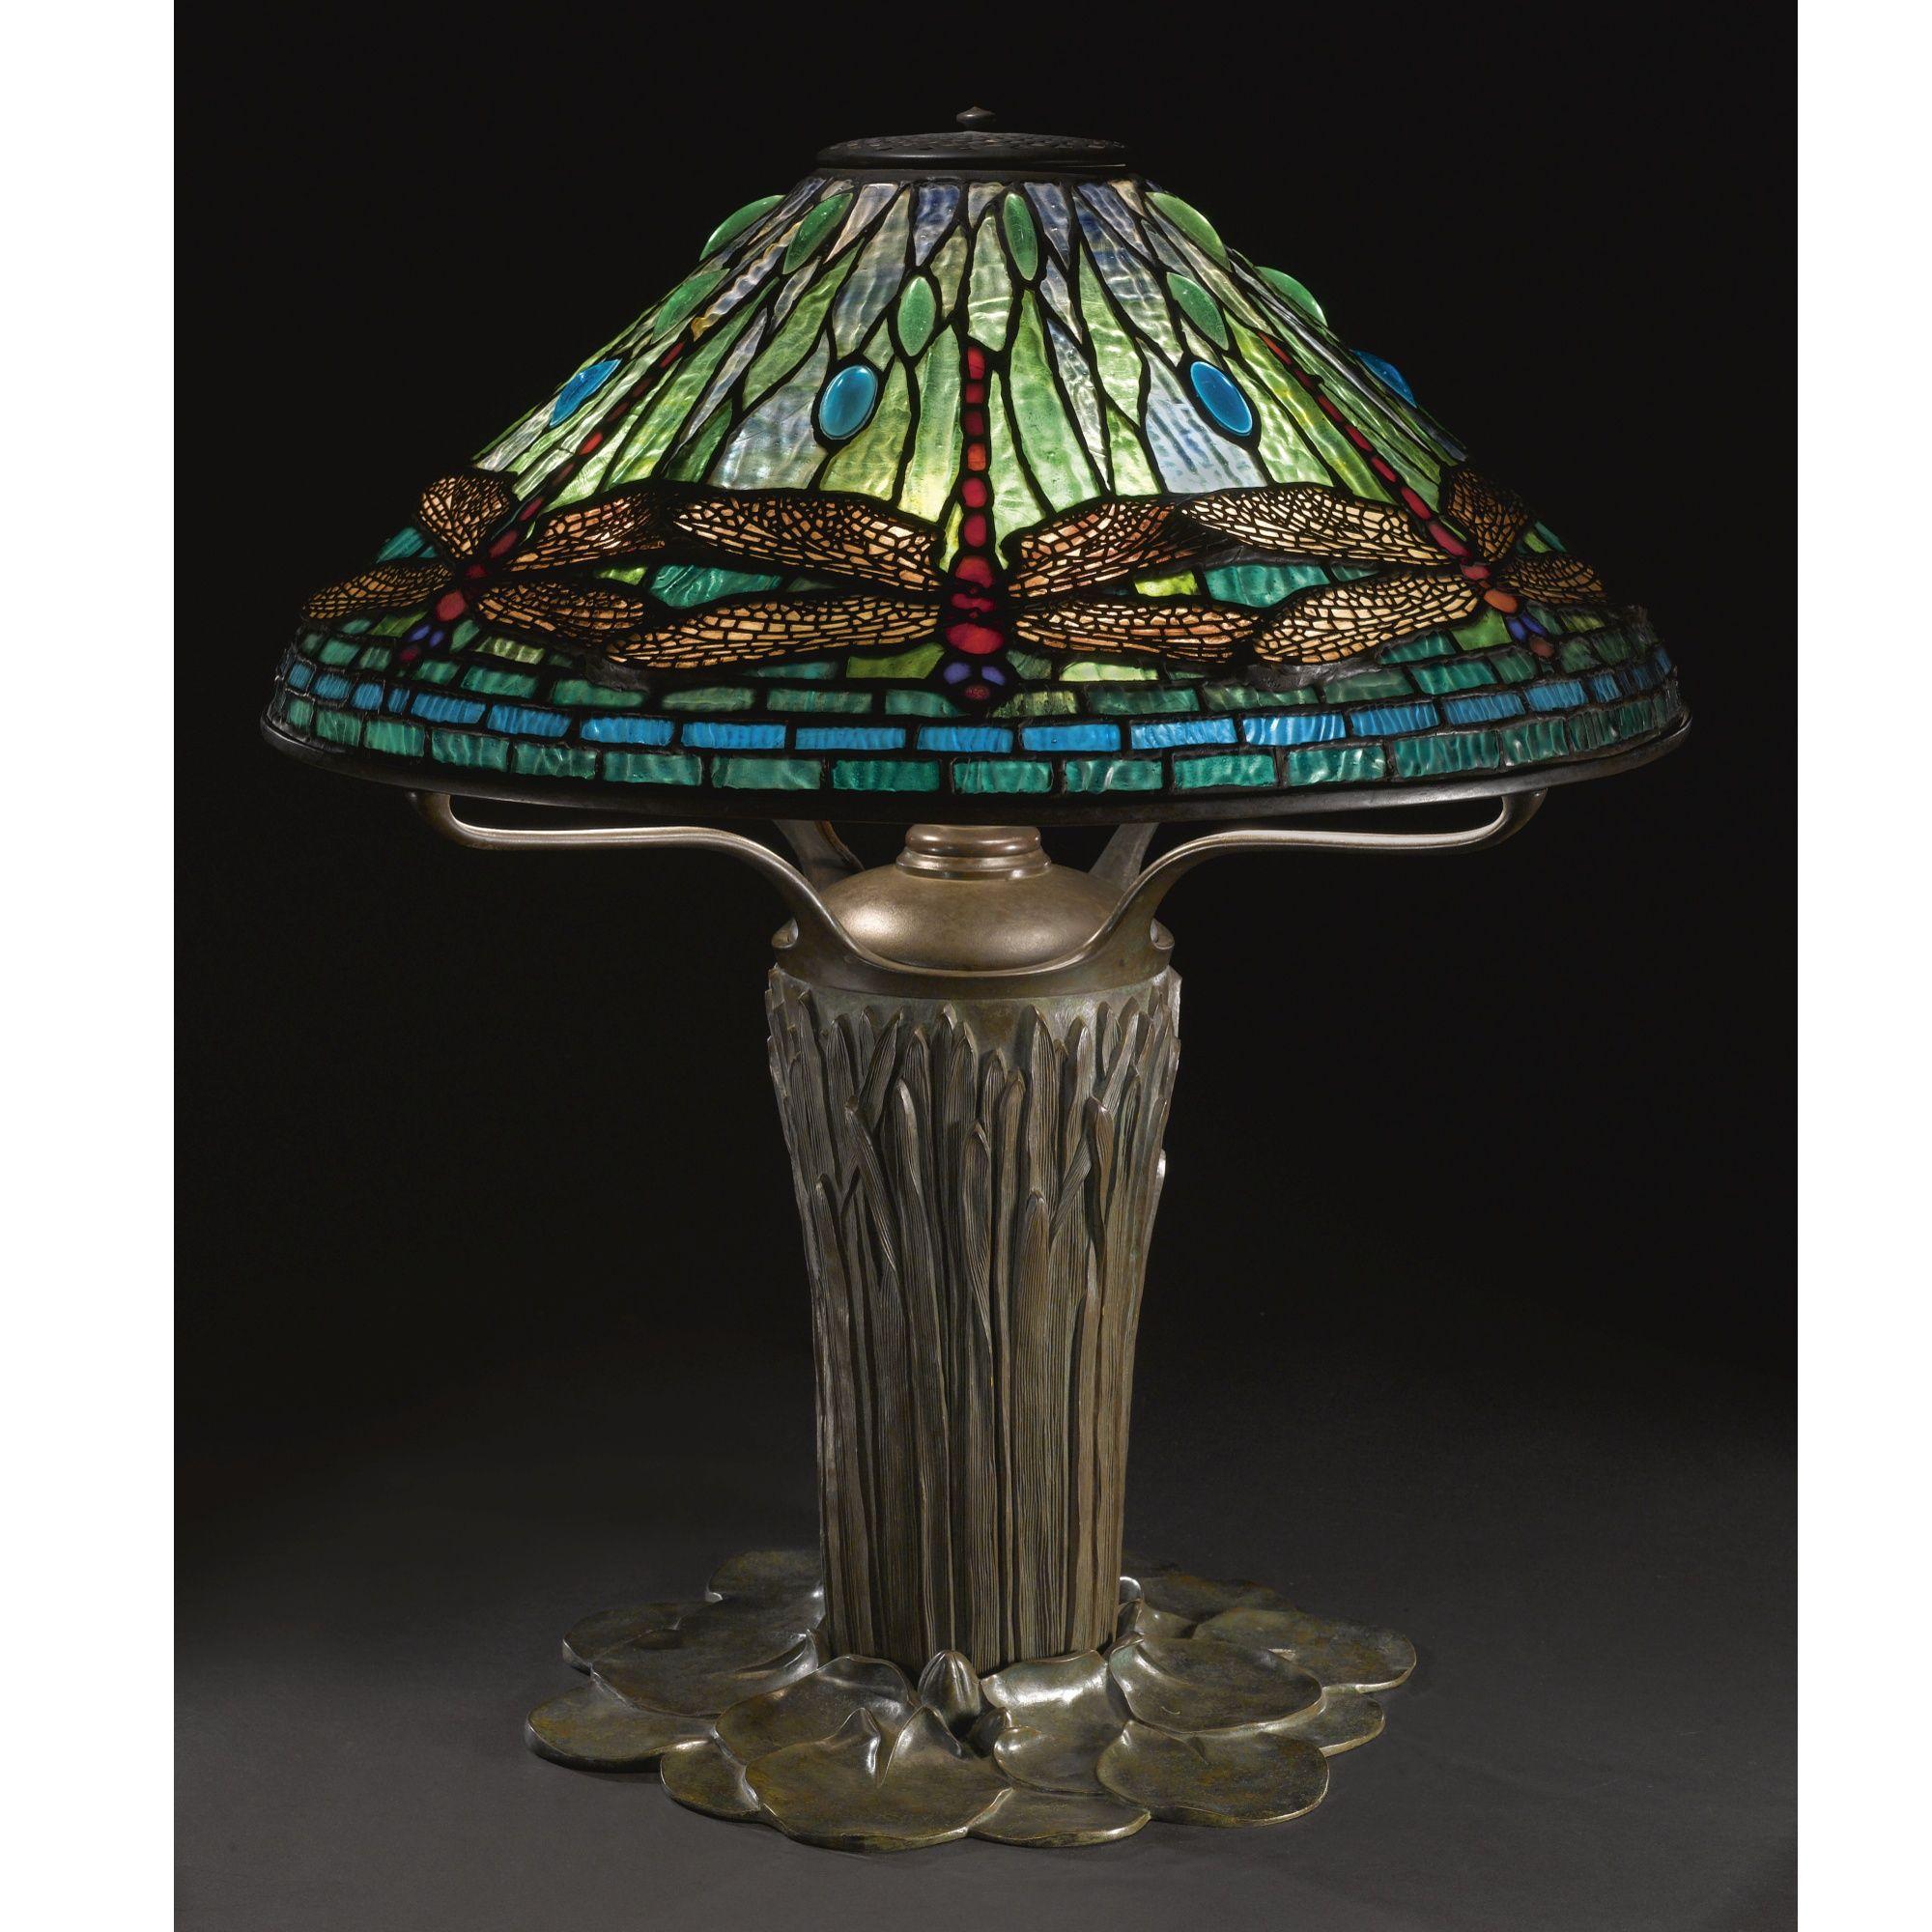 Tiffany studios lot sotheby dragonfly table lamp oil font tiffany studios lot sotheby dragonfly table lamp oil font impressed 5 geotapseo Gallery